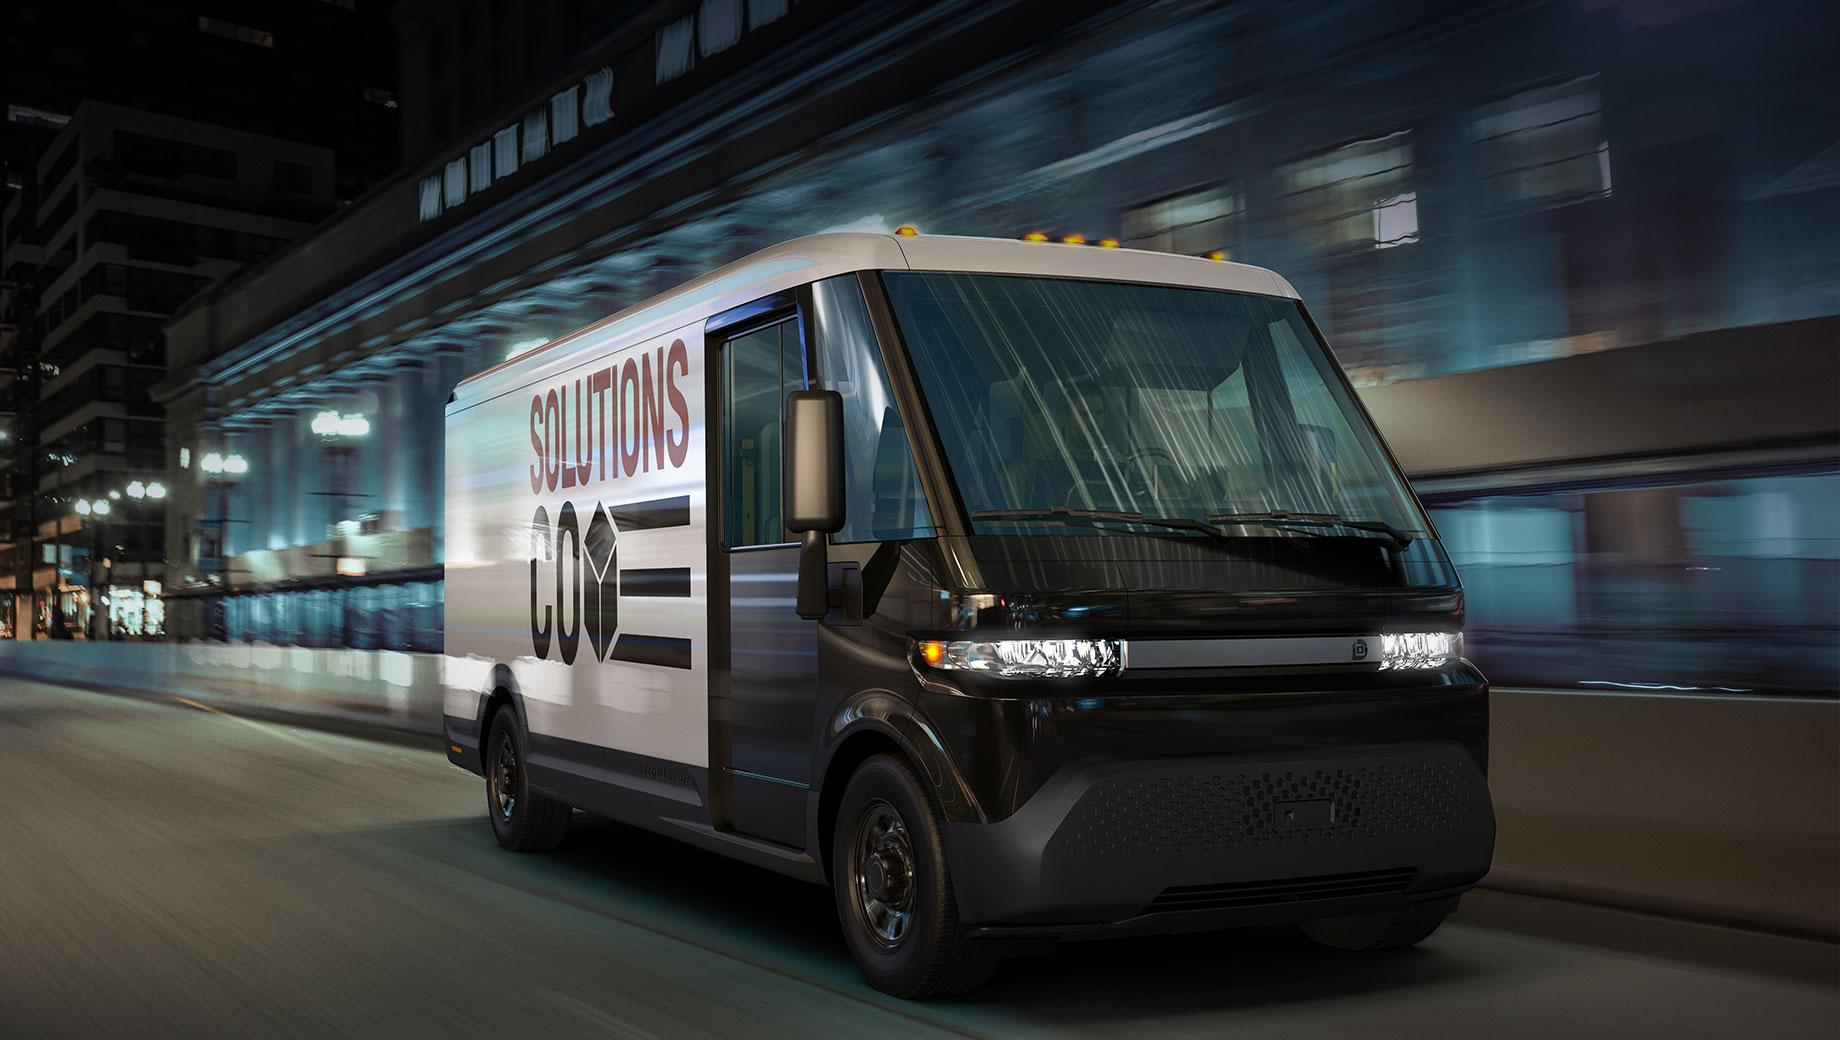 Концерн GM запустил доставочный бизнес BrightDrop